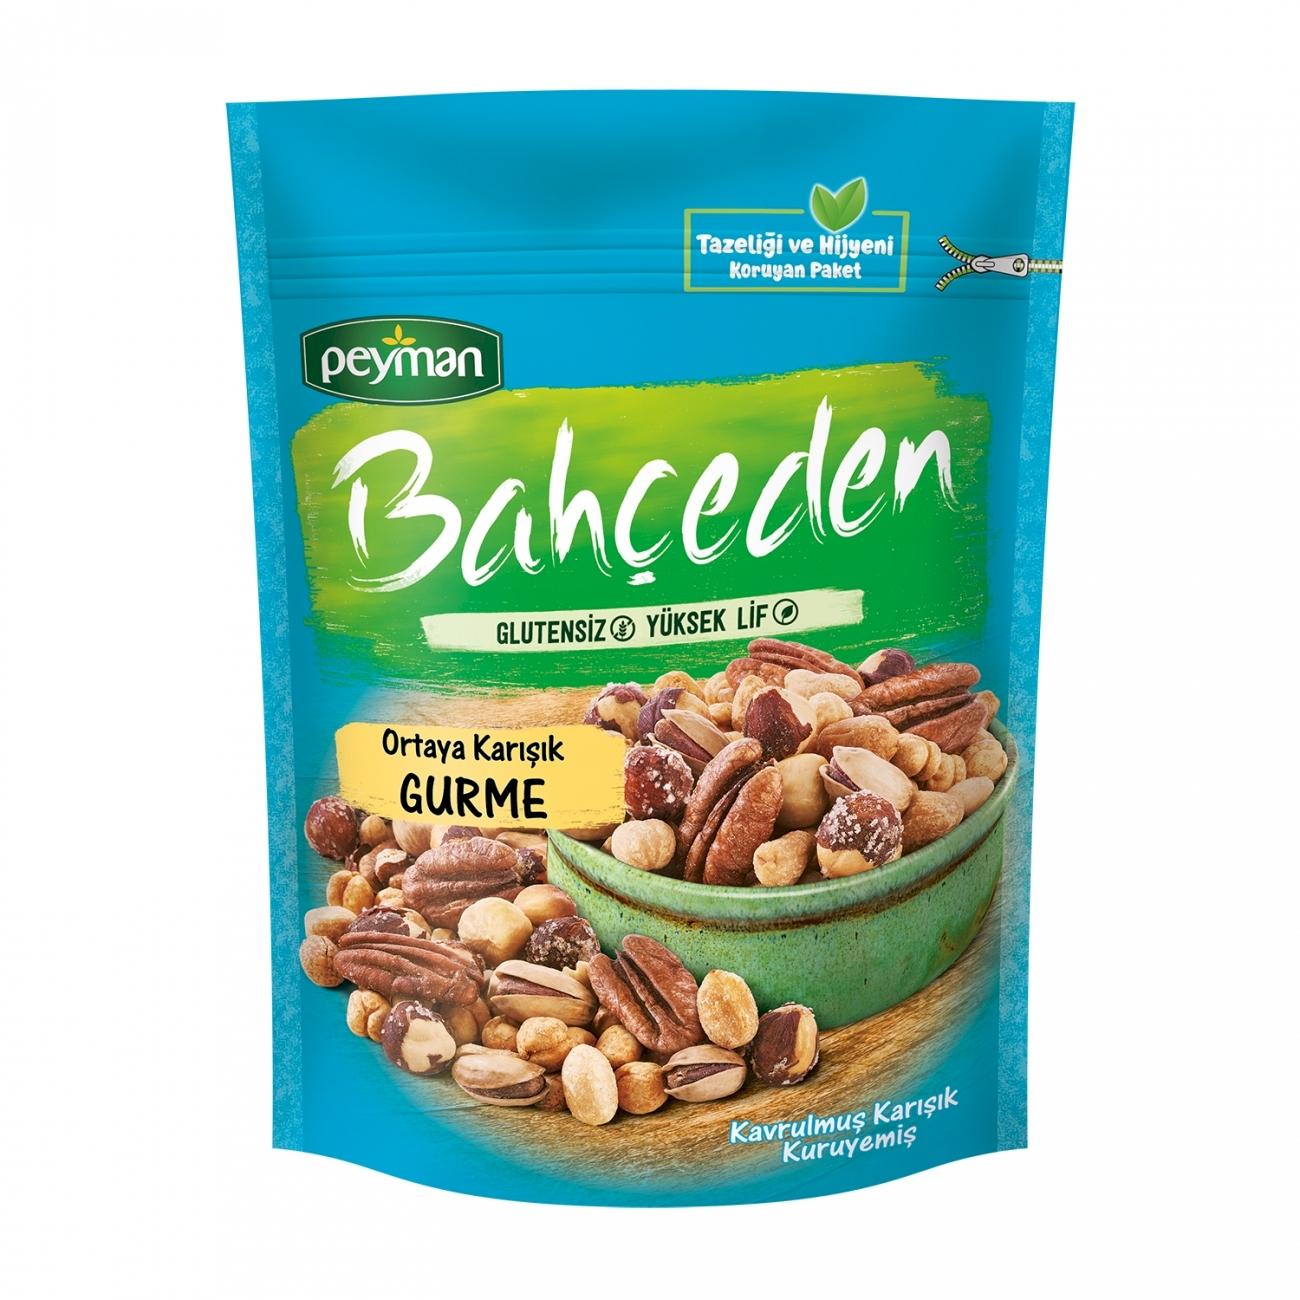 Peyman Bahceden Gourmet Roasted Mix Nuts Gluten Free 140 gr